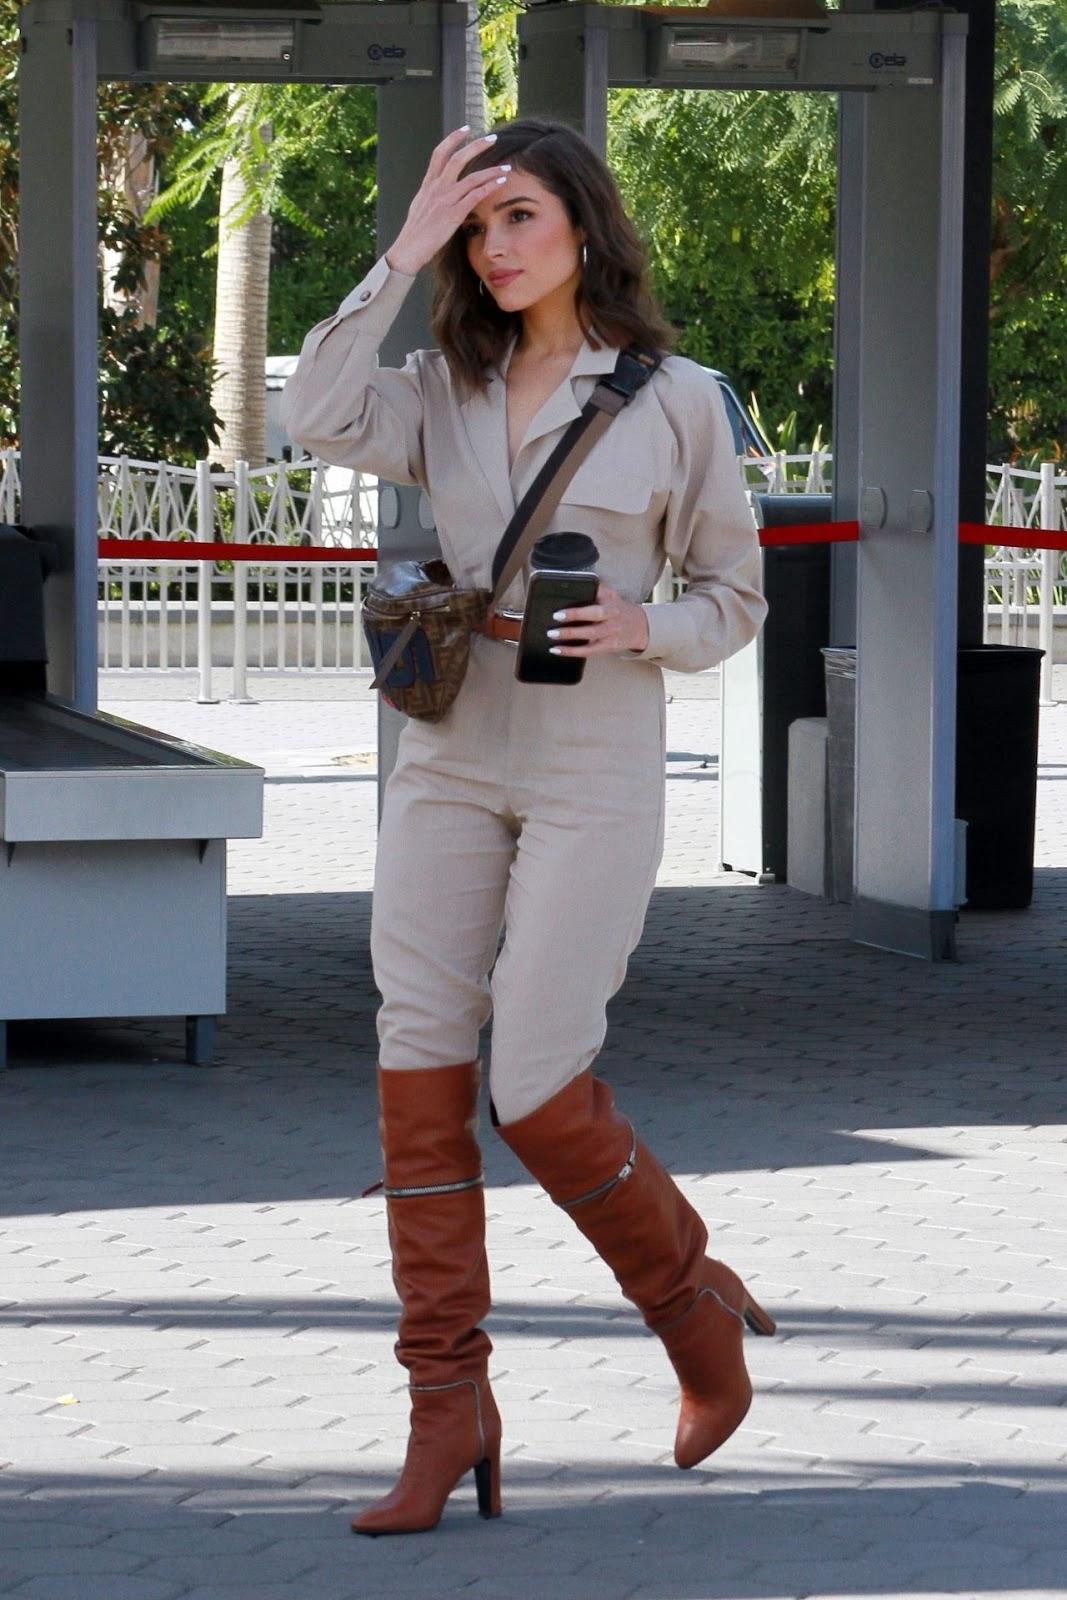 0bad9050bf3 LoveLuxury  Olivia Culpo Style - Olivia Culpo s Best Looks and Outfits